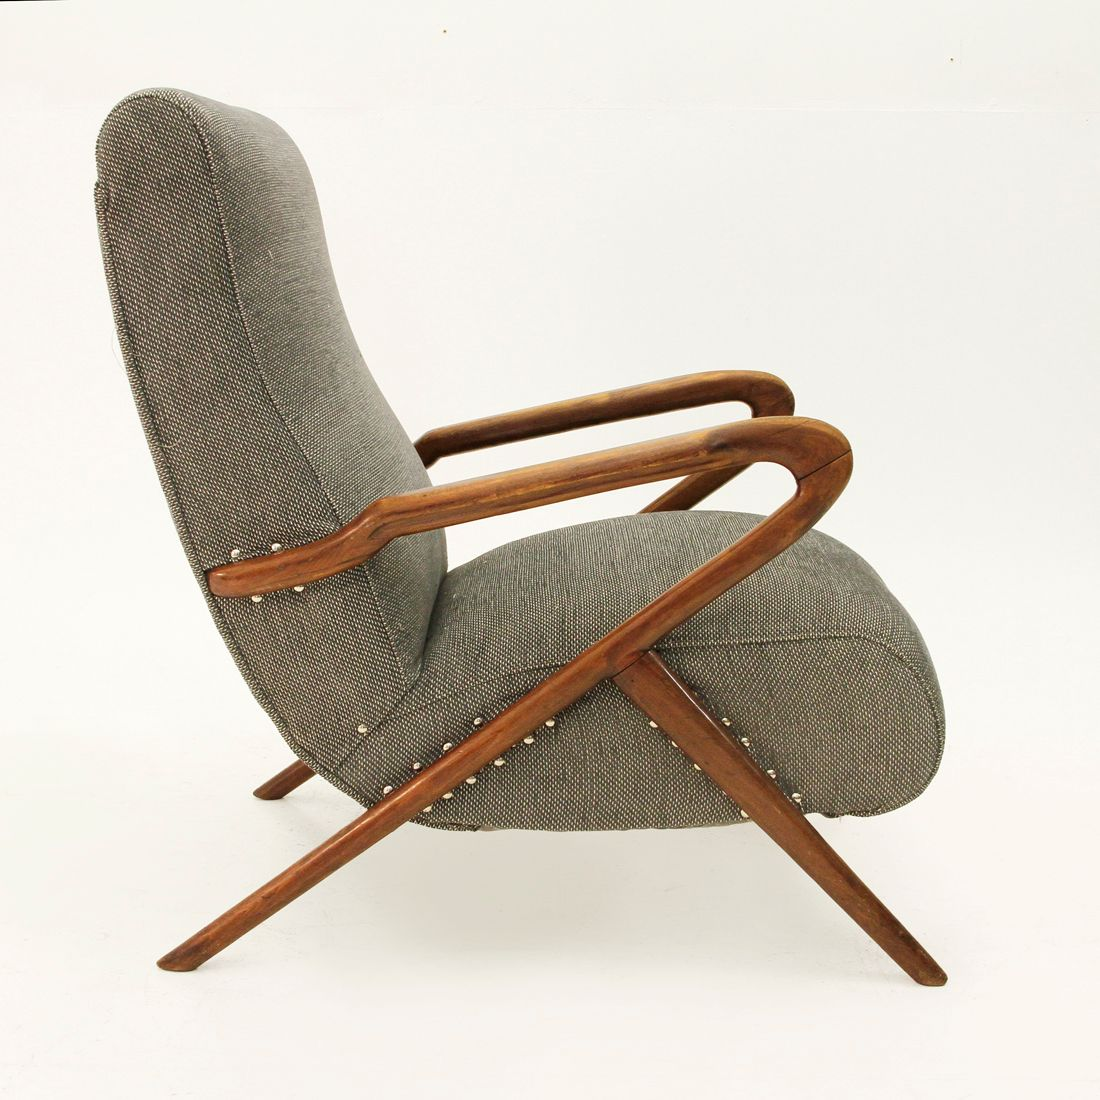 Artdeco Sessel deco sessel mit holzgestell 1940er bei pamono kaufen